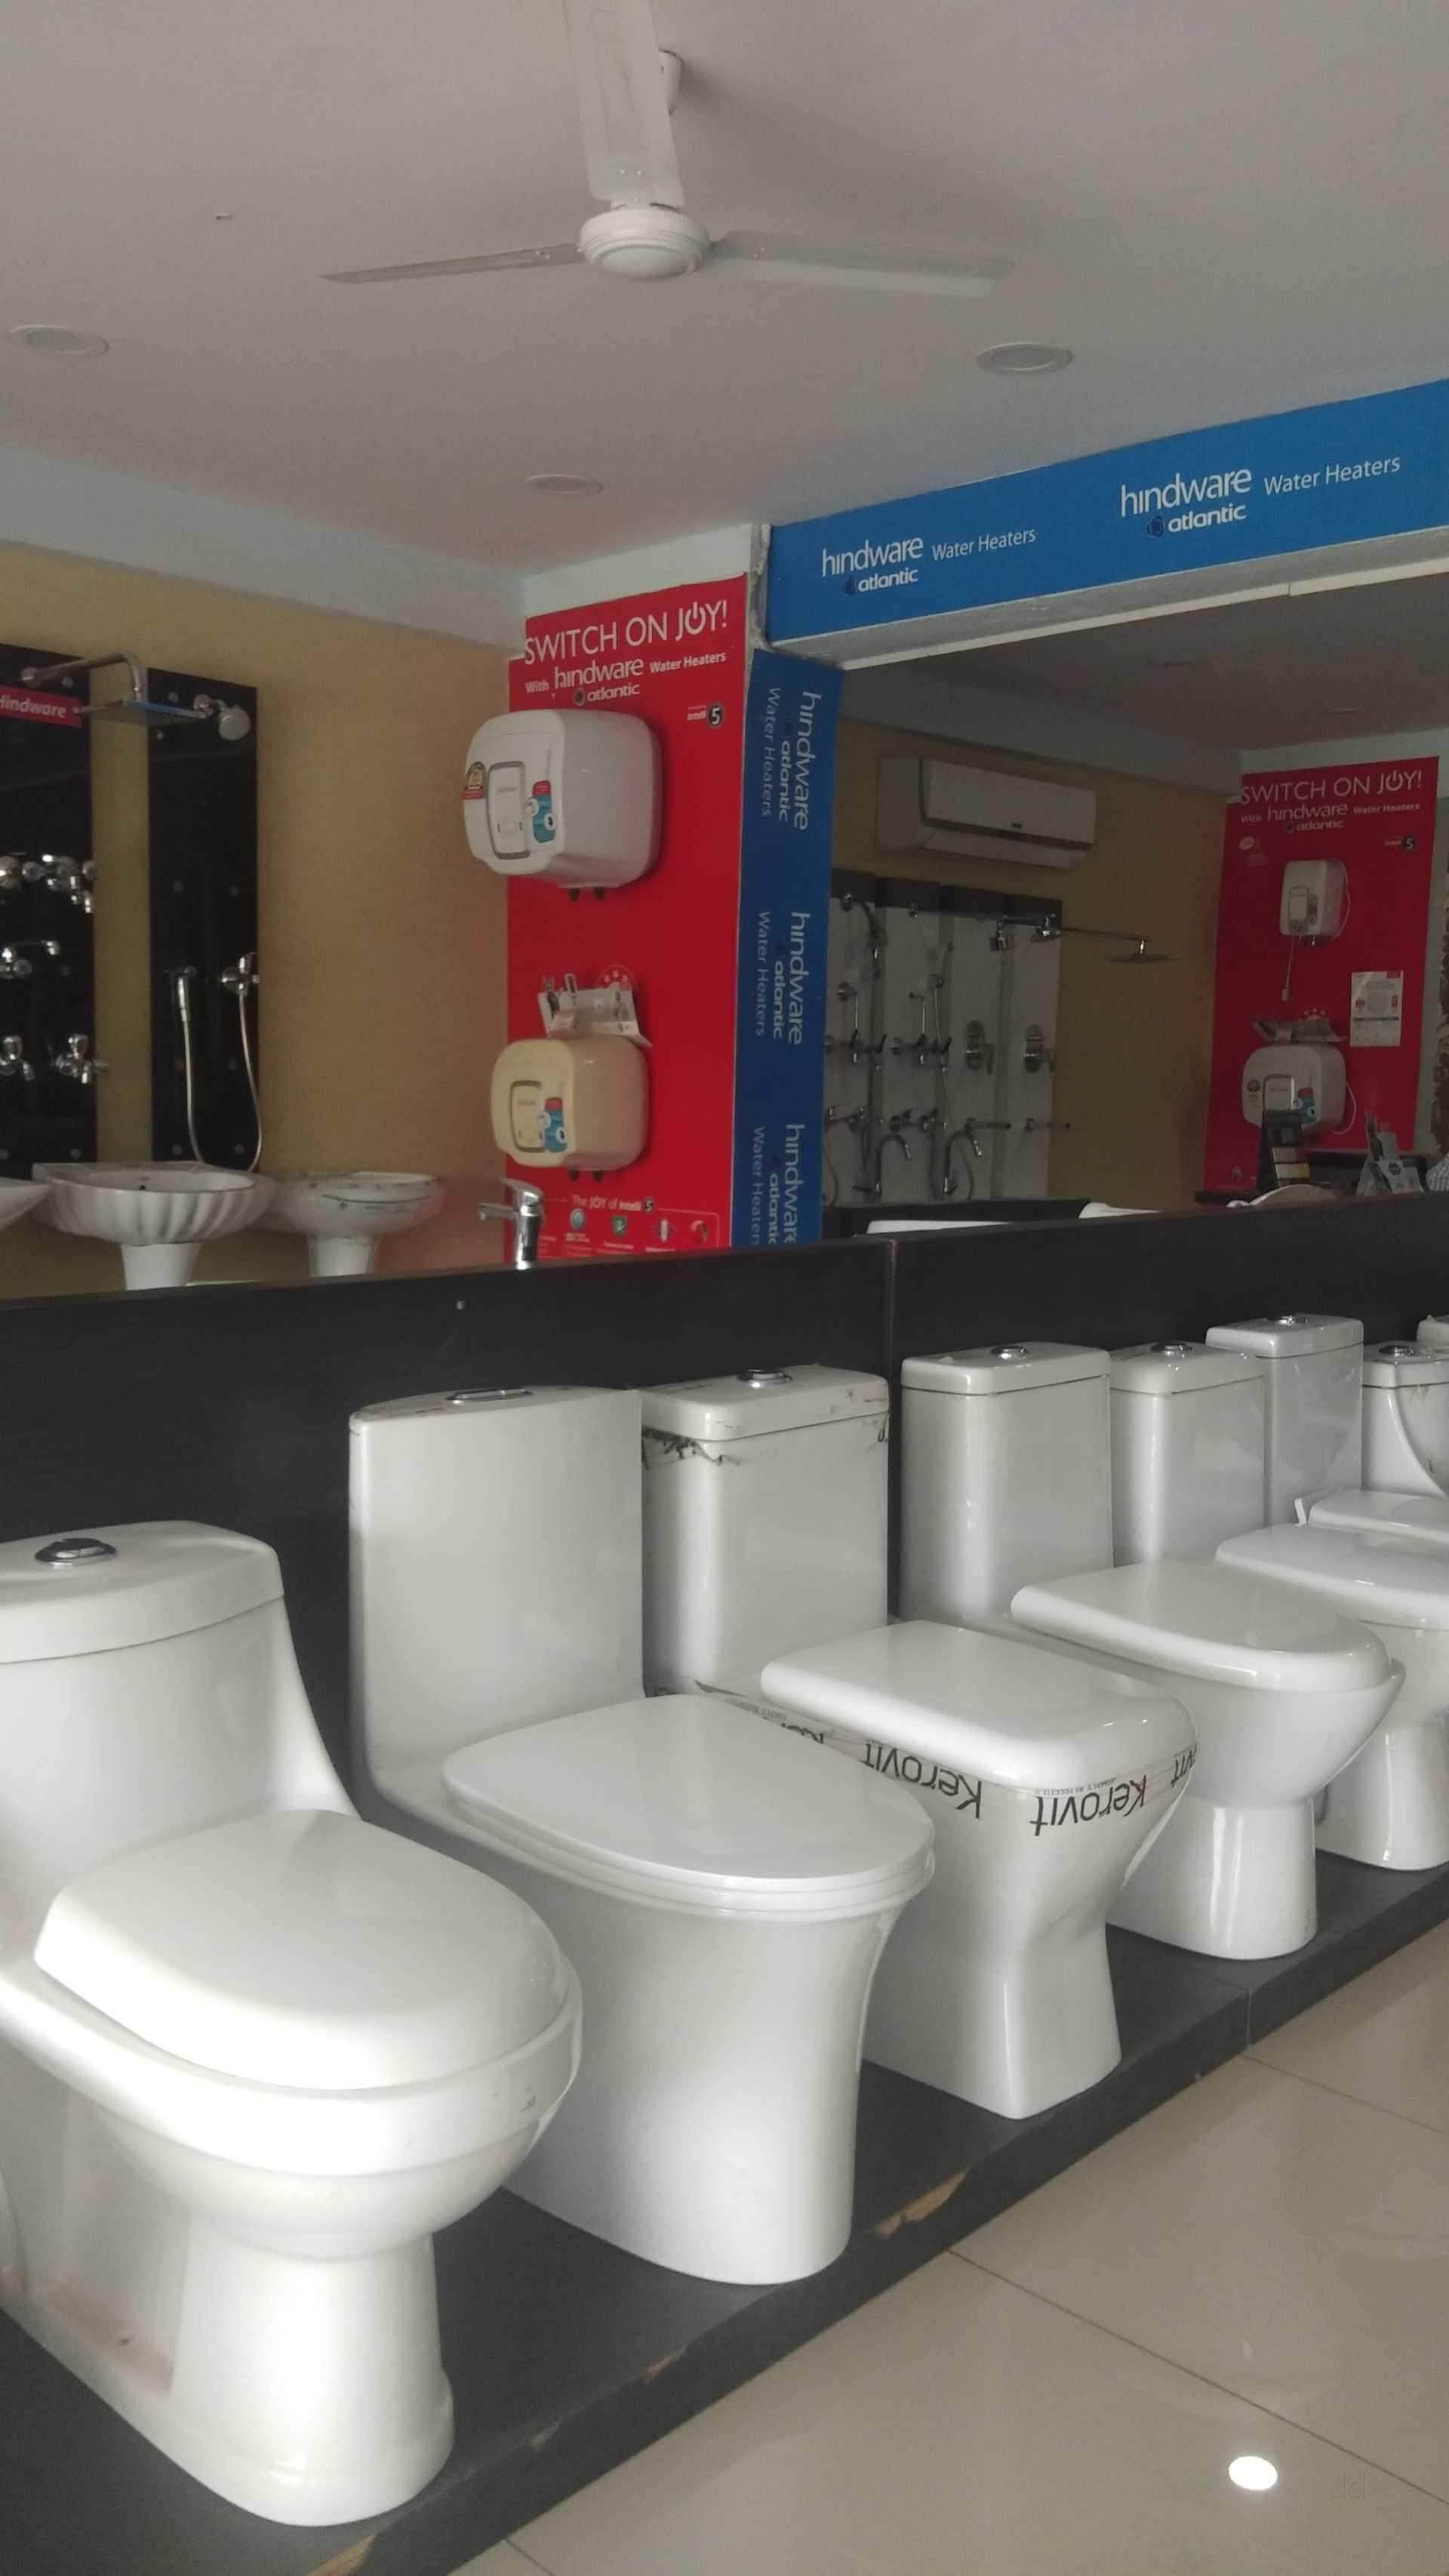 Hindware Sanitaryware Dealers in Hyder Shah Kote, Hyderabad